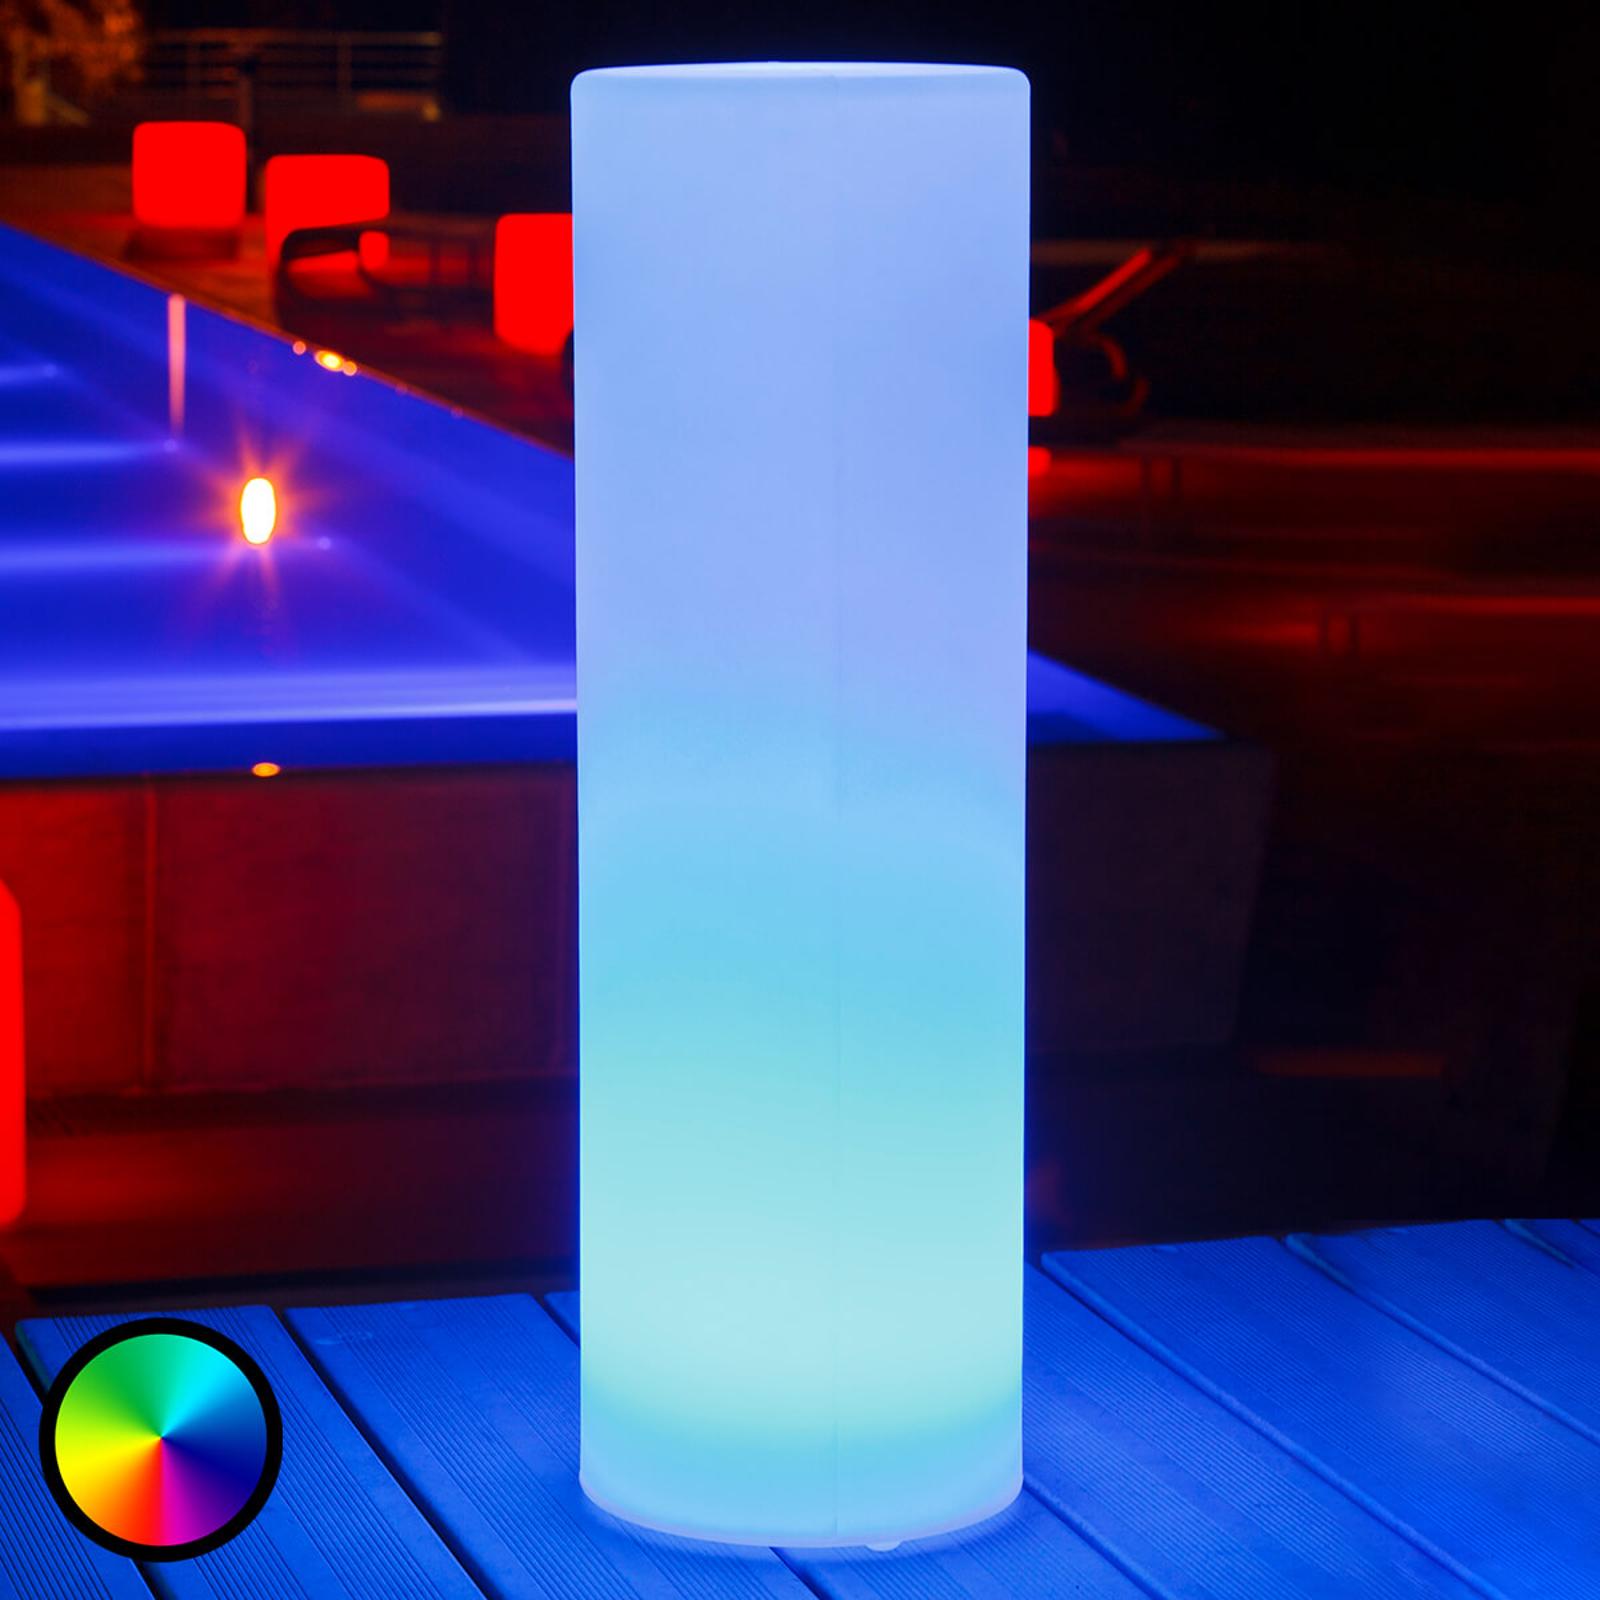 Tower - LED-dekorationslampe, kan styres per app